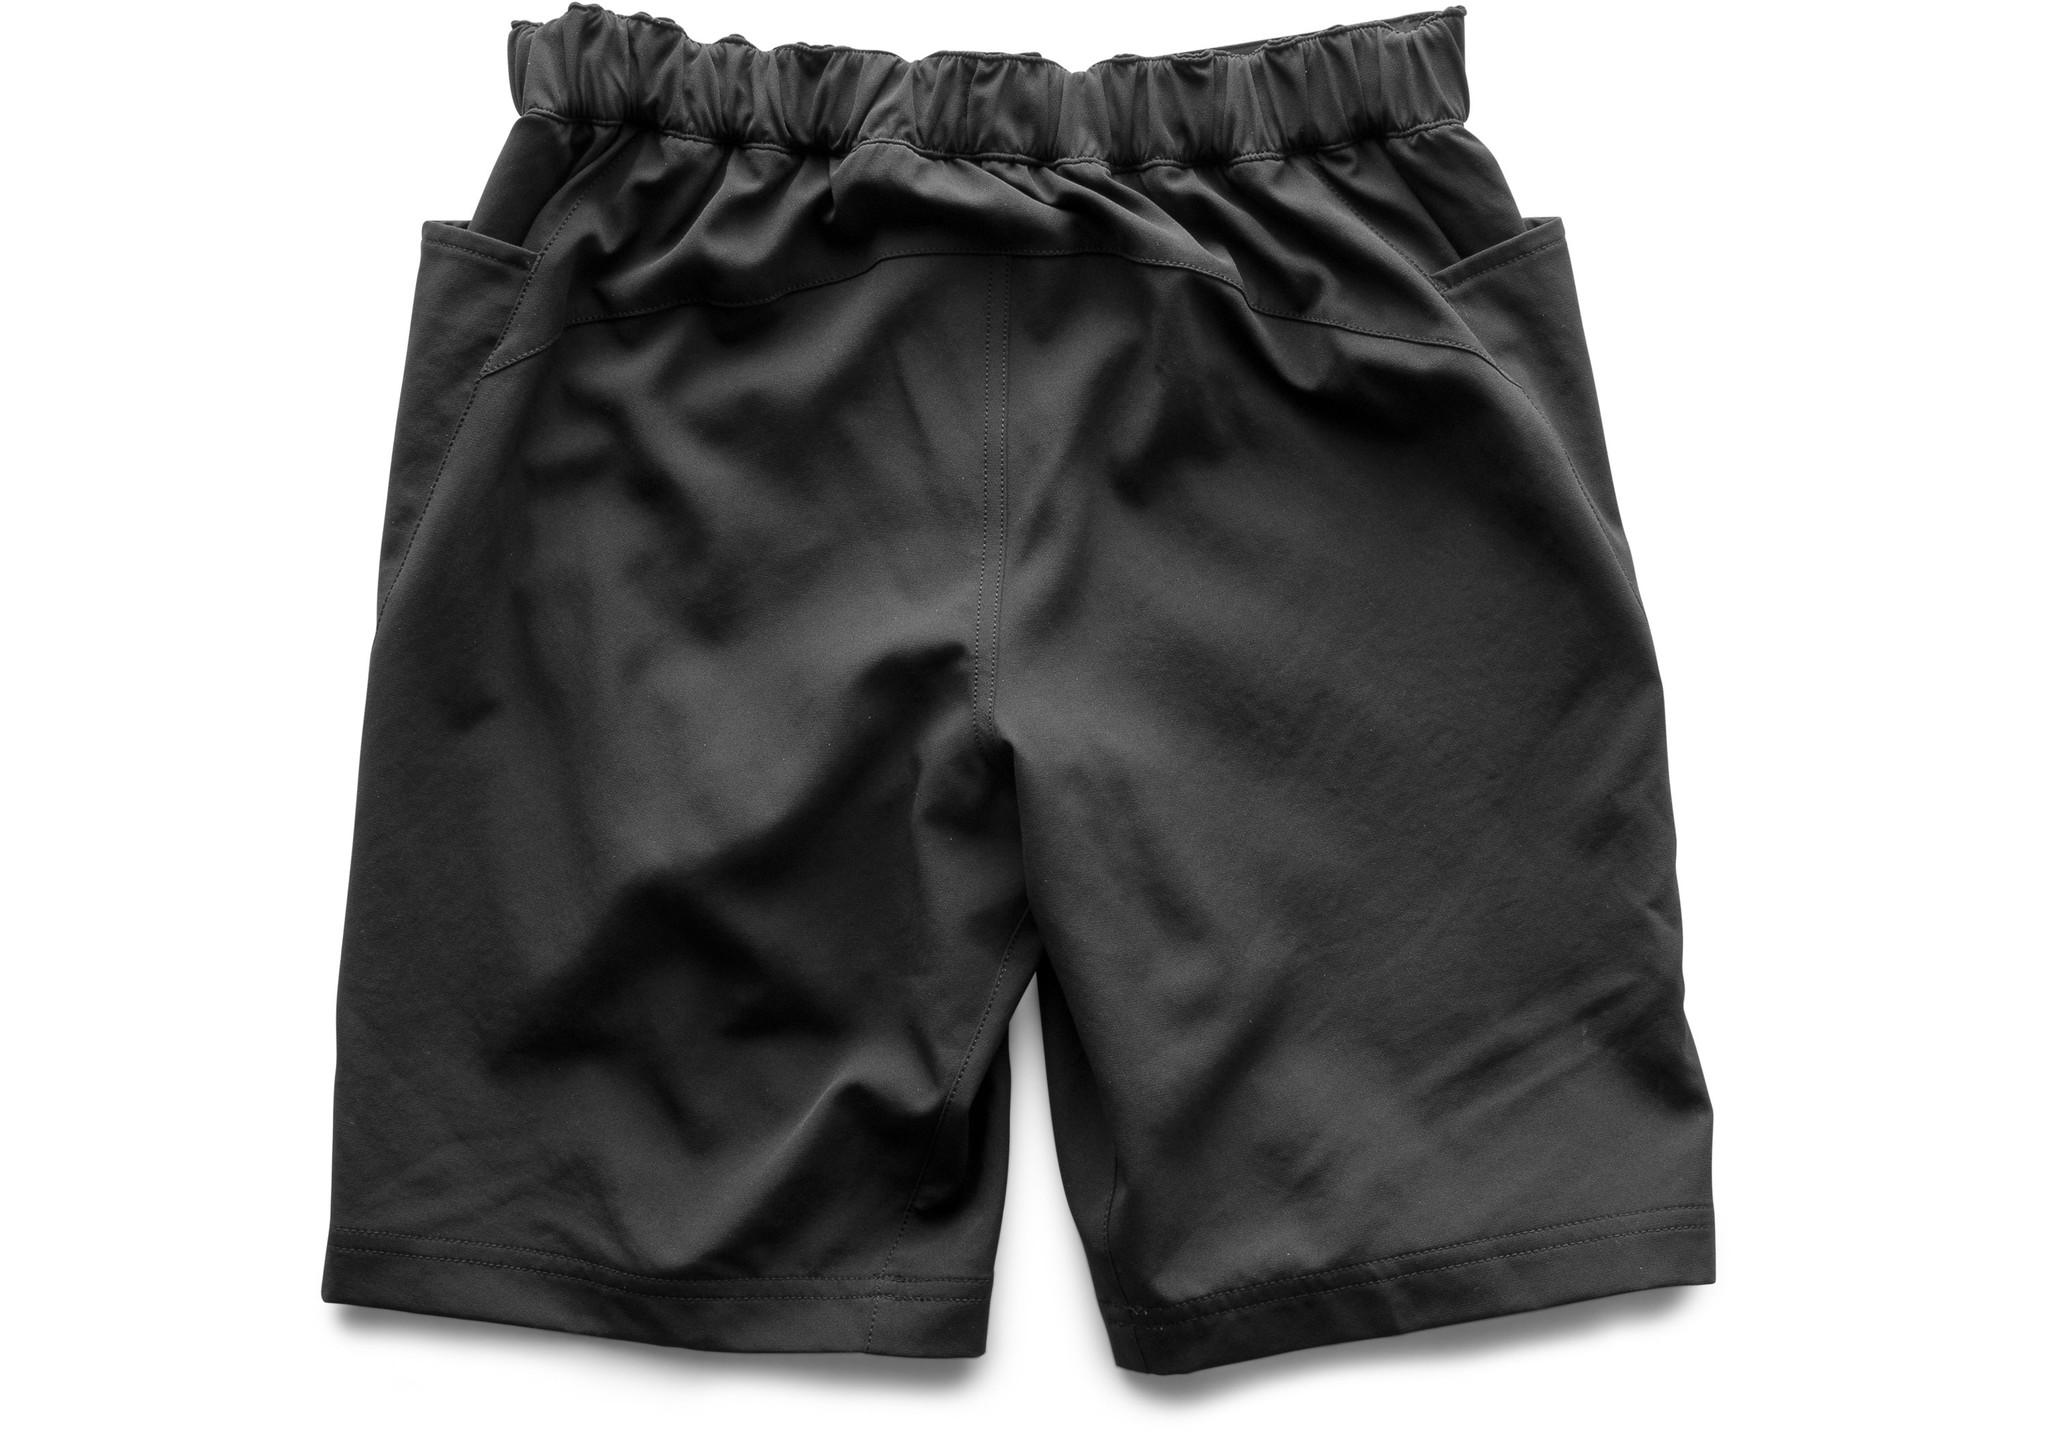 Specialized Specialized Enduro Grom Shorts